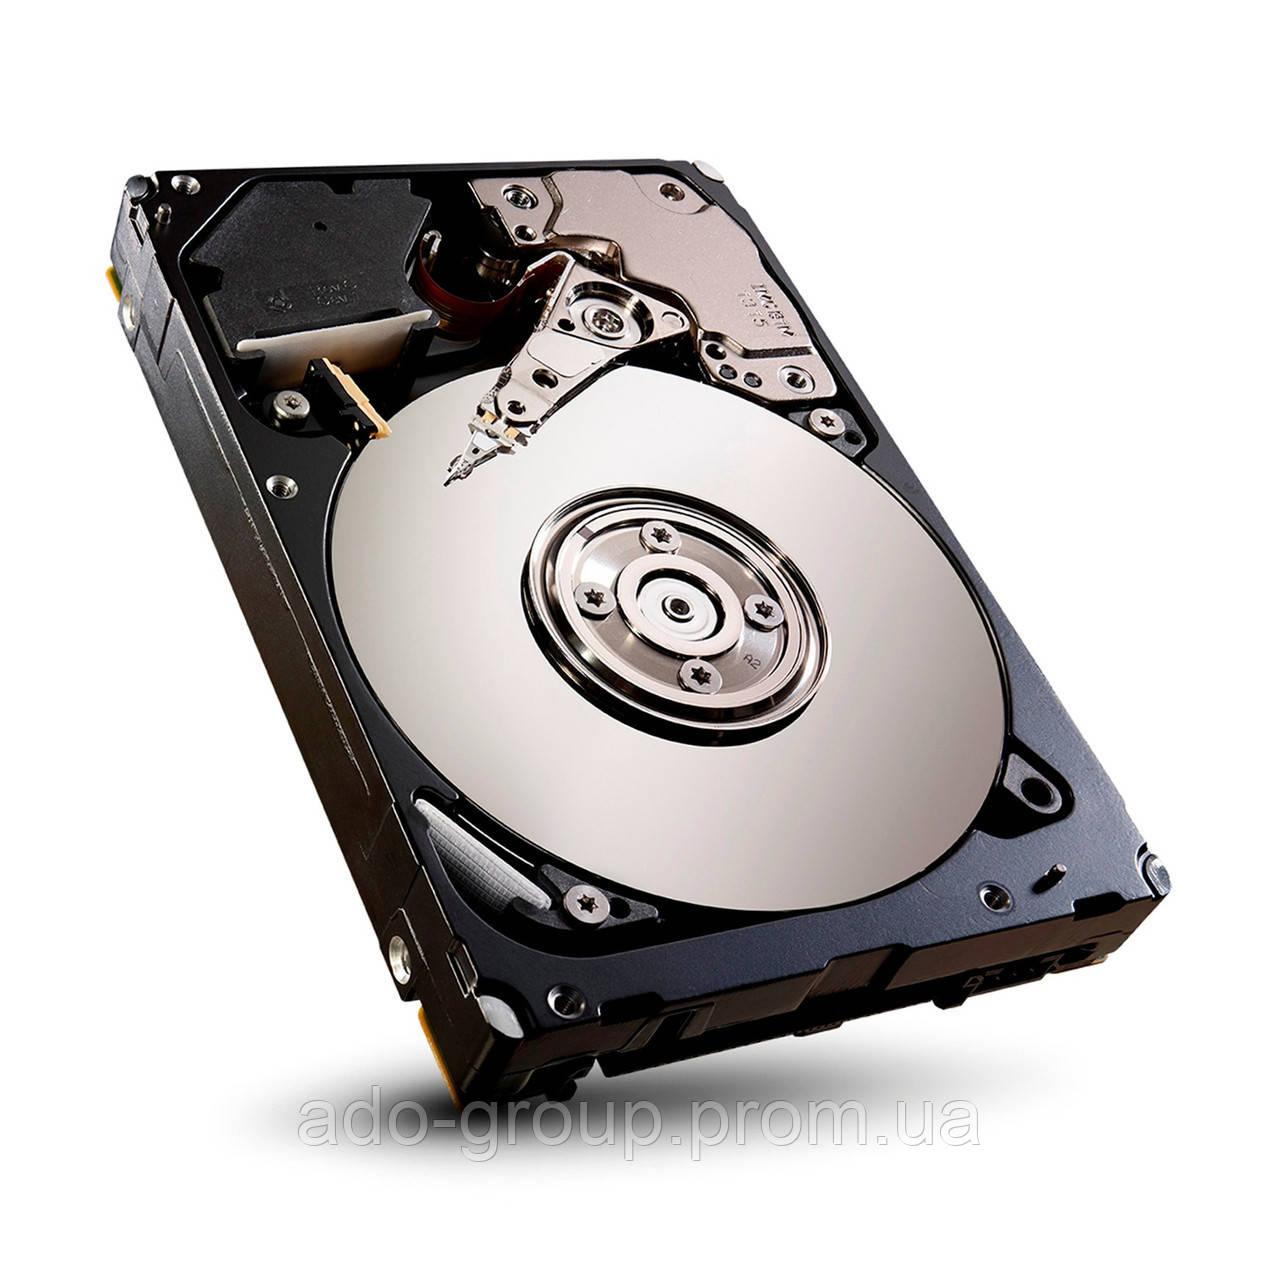 "DB0750BABFE Жесткий диск HP 750GB SAS 7.2K  3.5"" +"